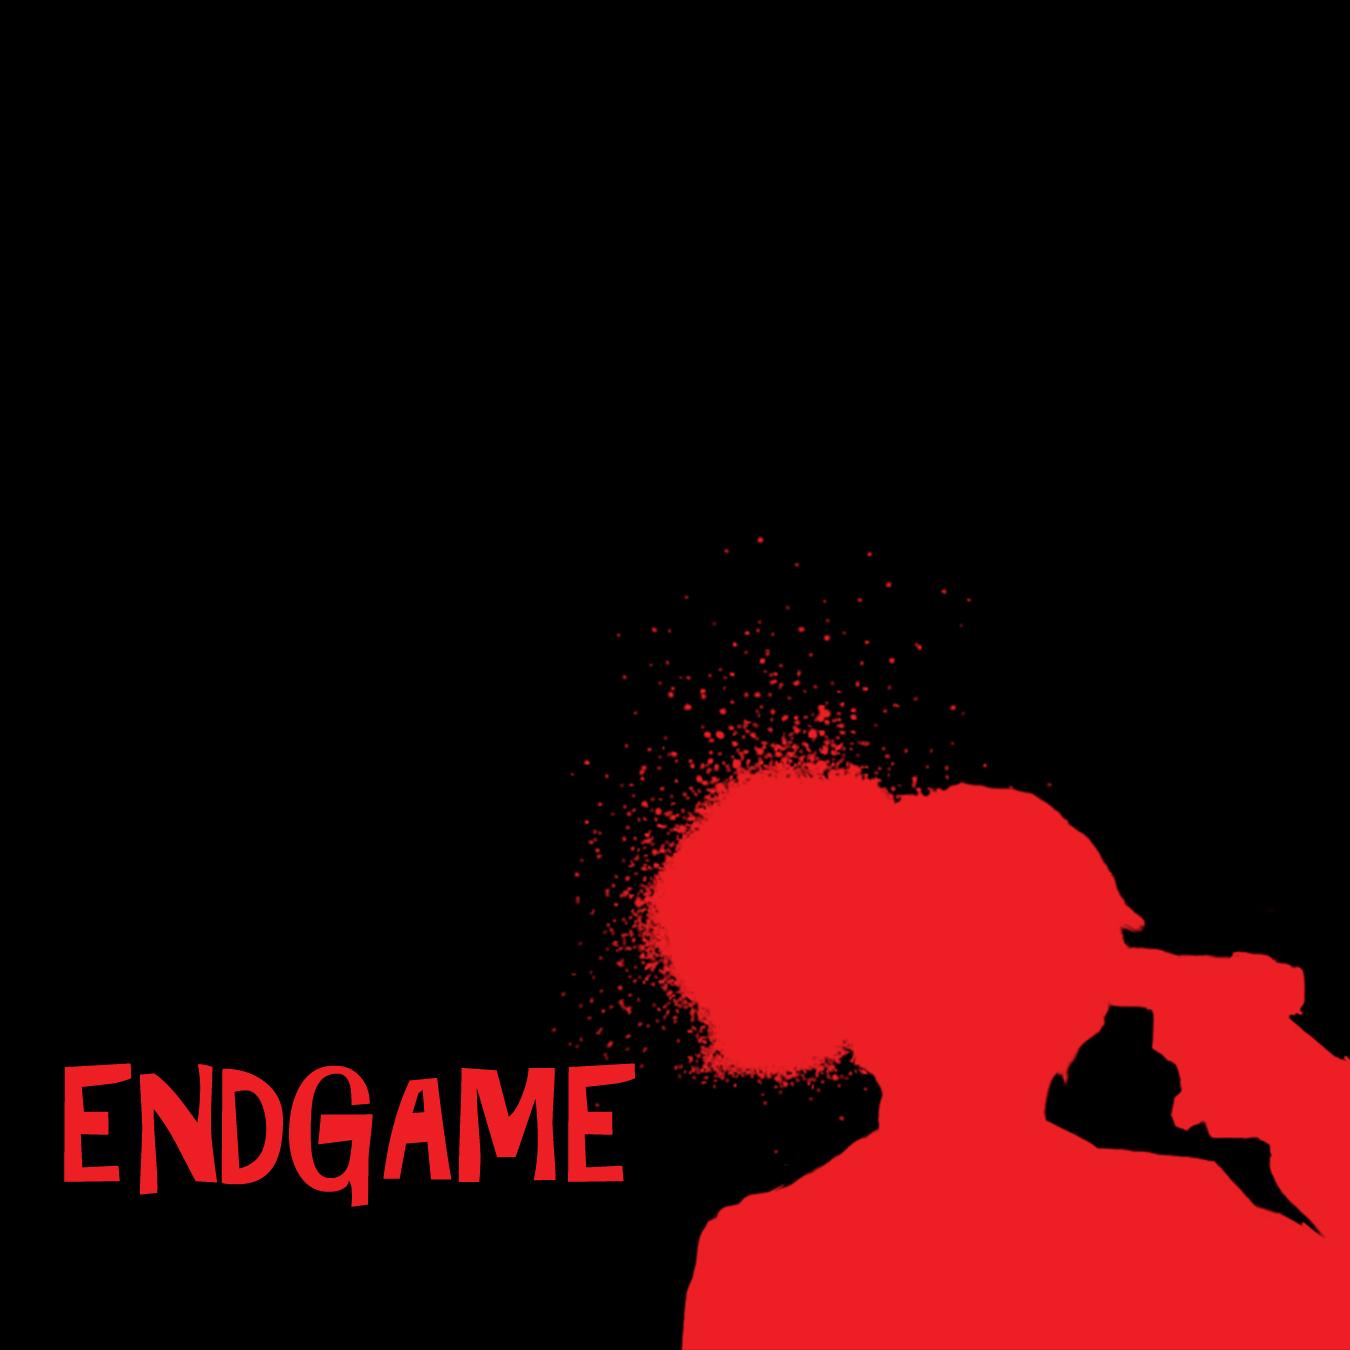 4542450_143273581662_endgame1.jpg